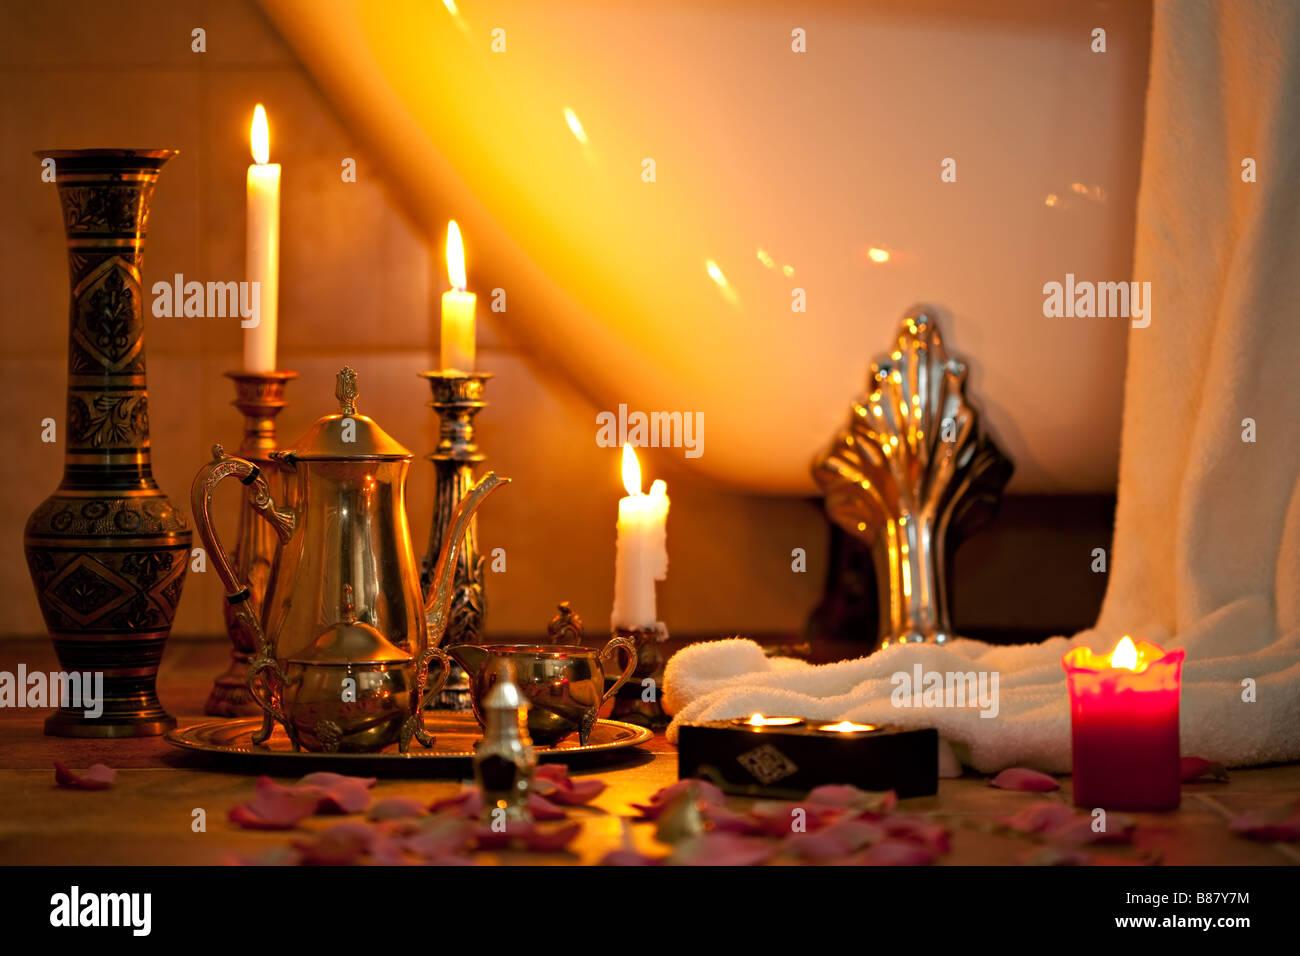 Stillleben mit Kerzen im Retro-Bad Stockbild